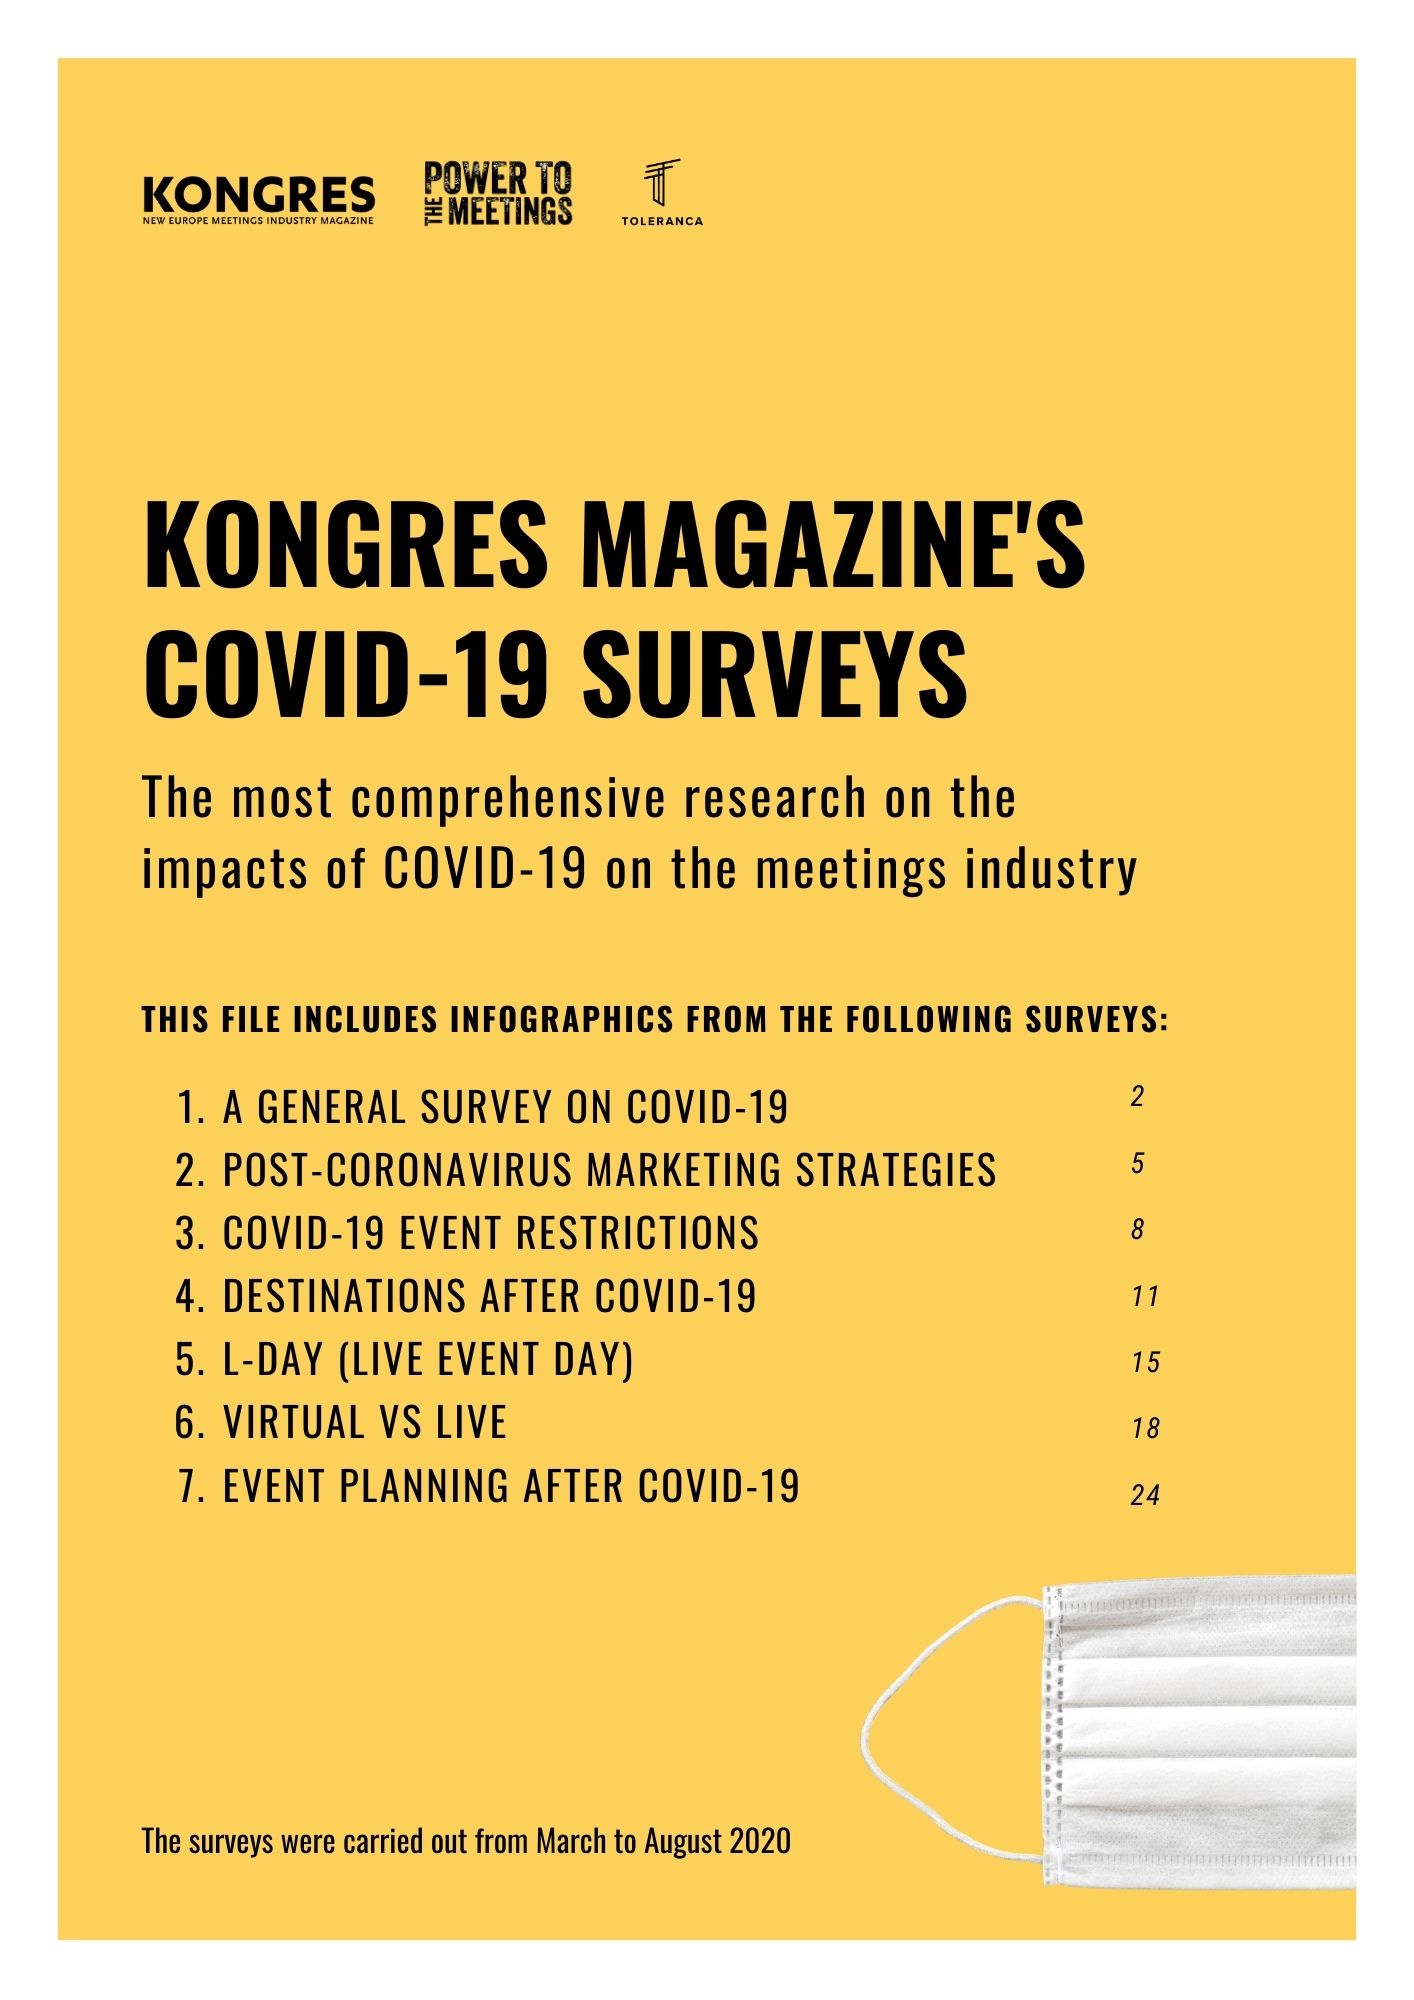 kongres-magazine_surveys_9.9.2020